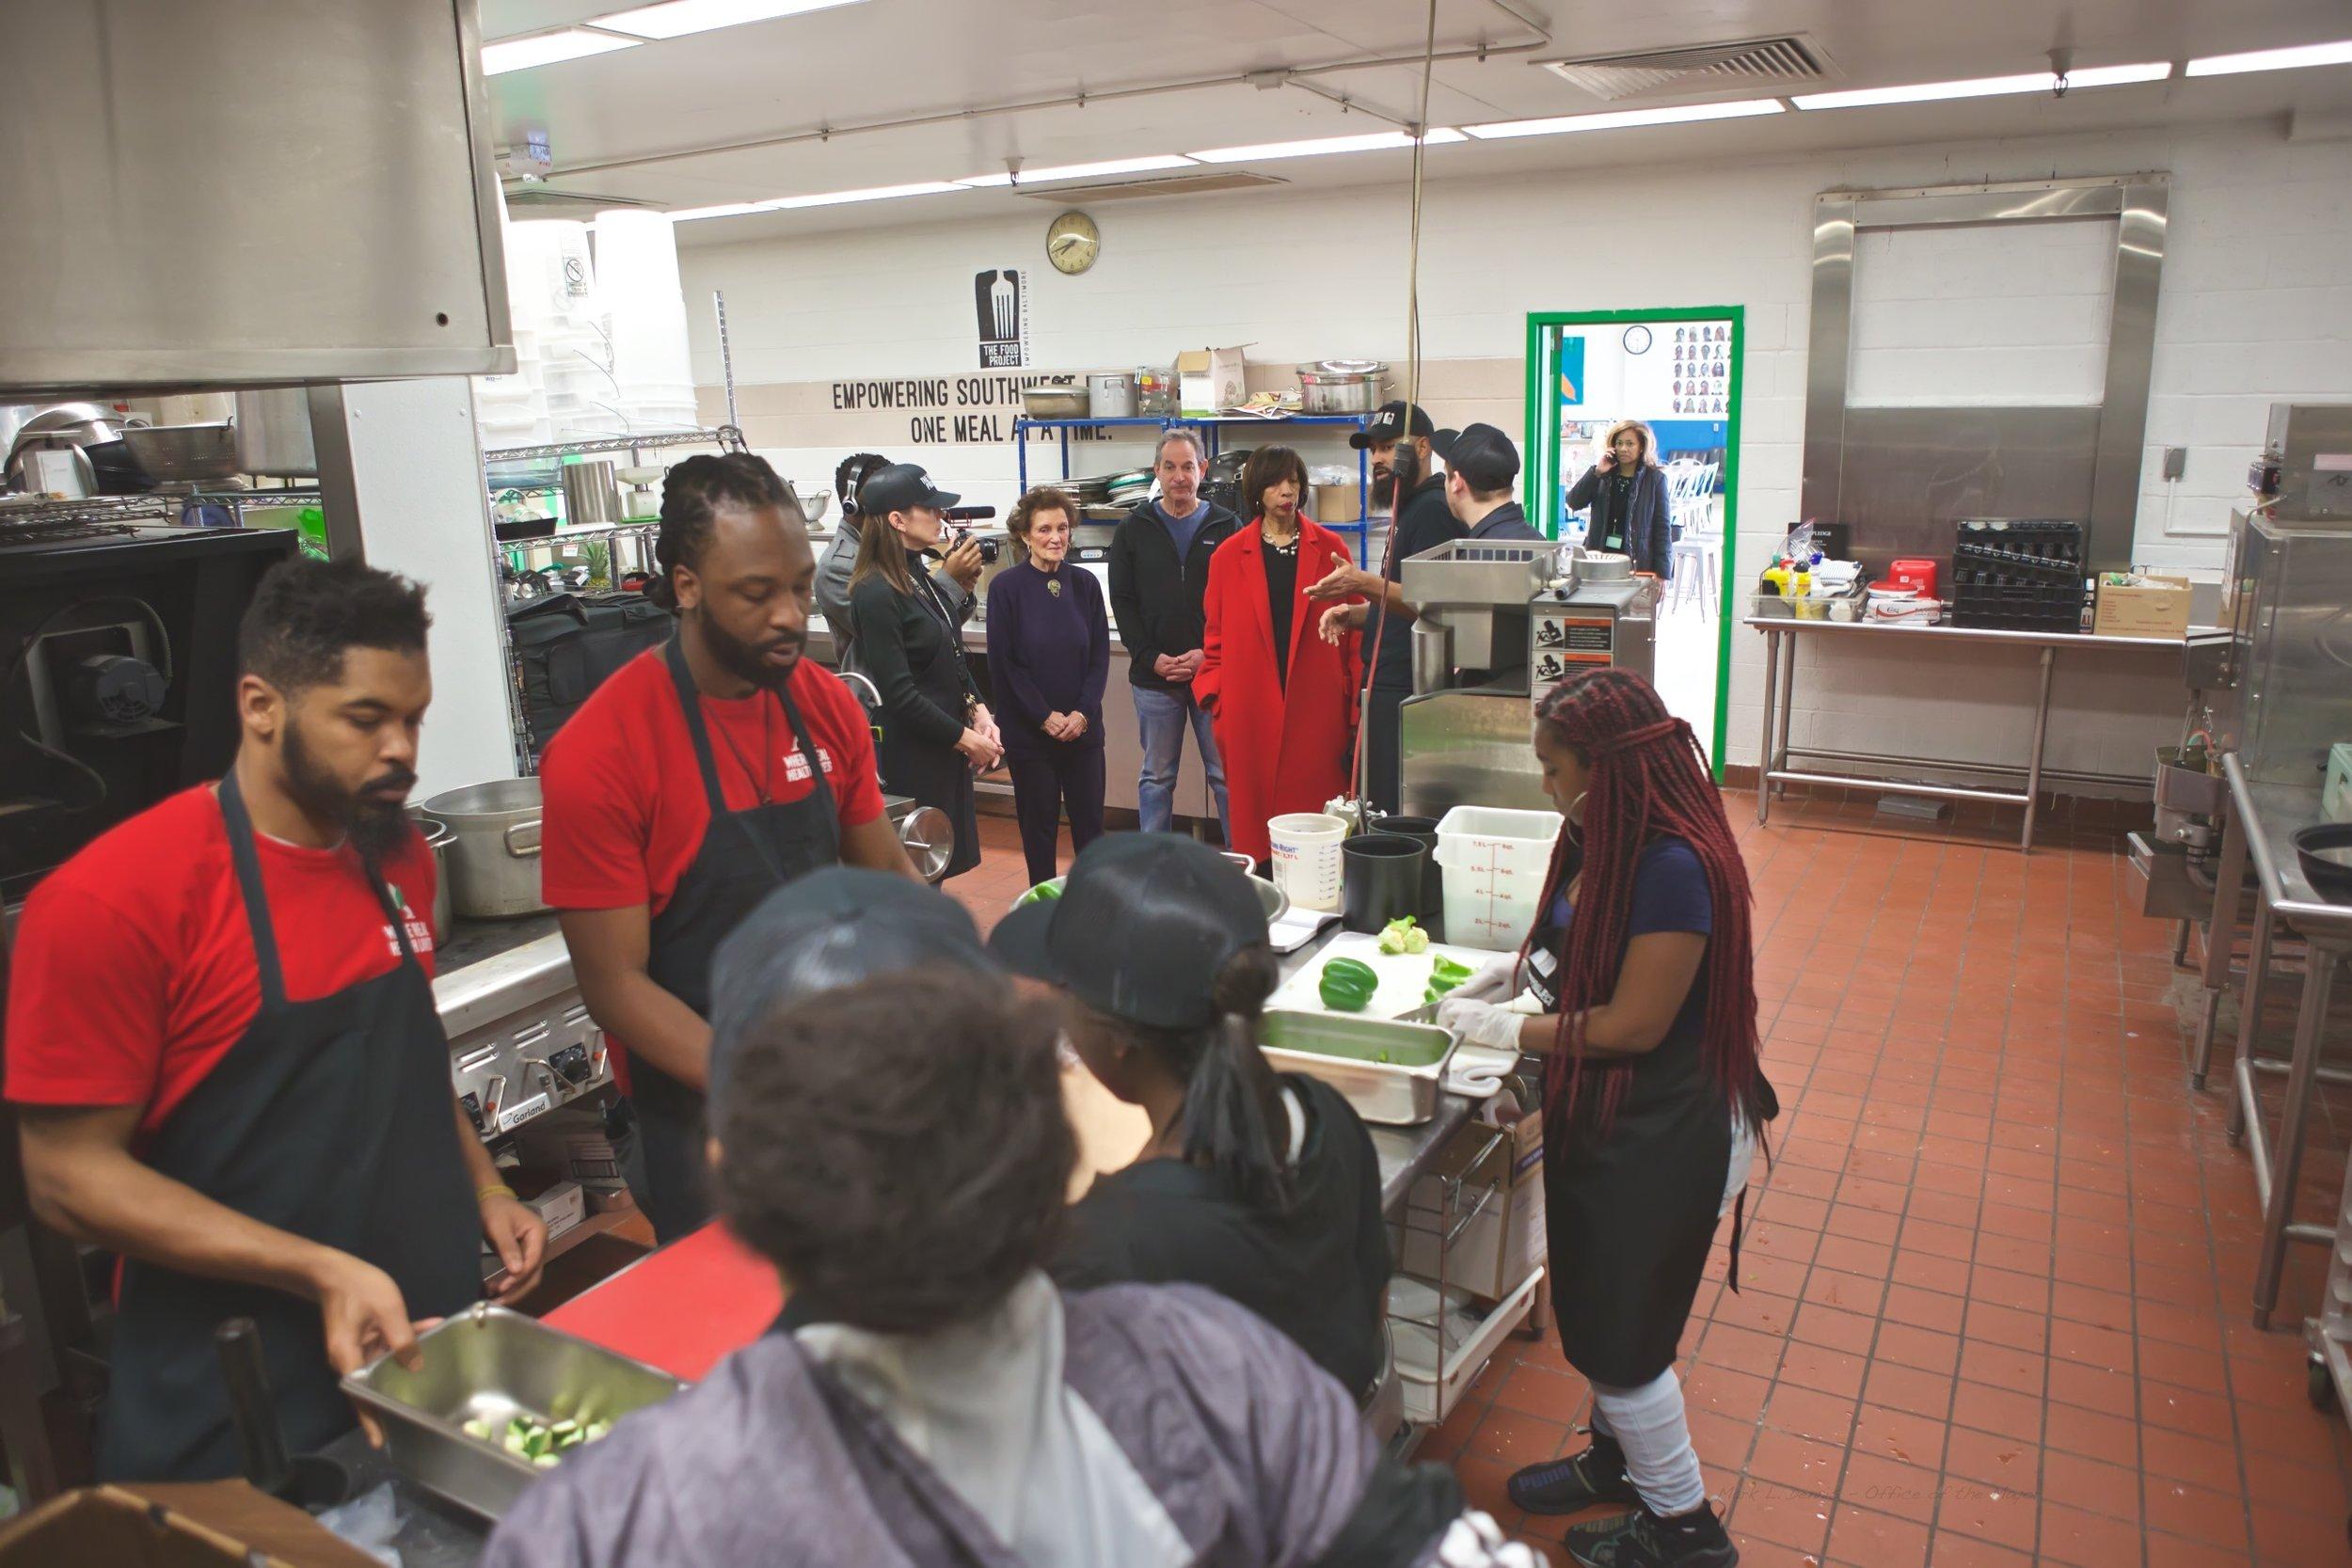 January 26, 2019 - Site visit to The Food Project, 424 S. Pulaski Street 2019-01-26 (6) (1).jpg